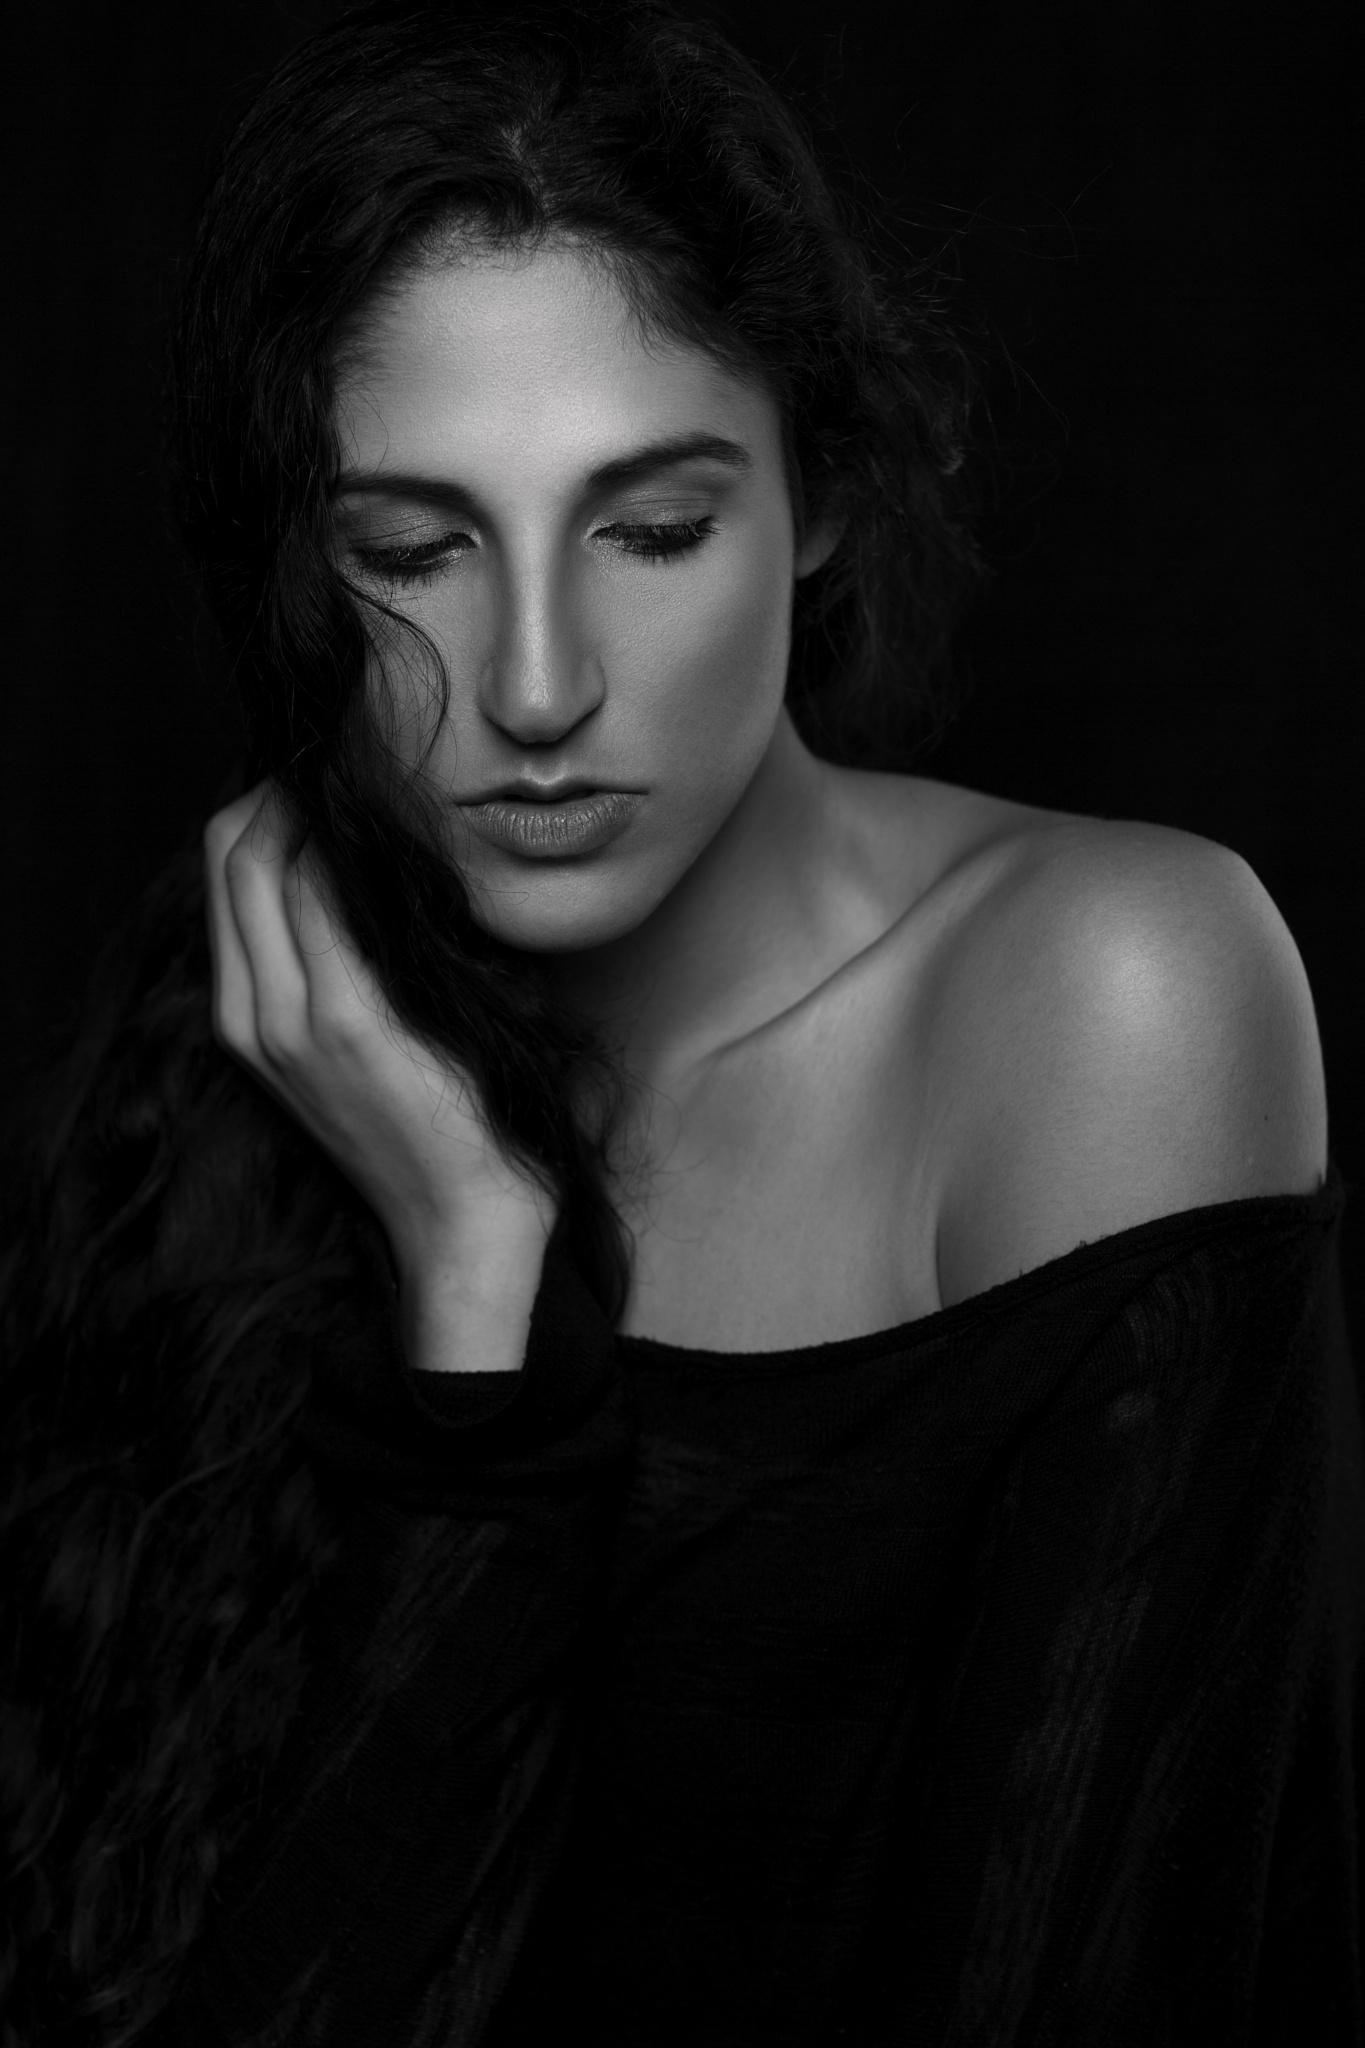 Danielle d by Paul Henry Collins